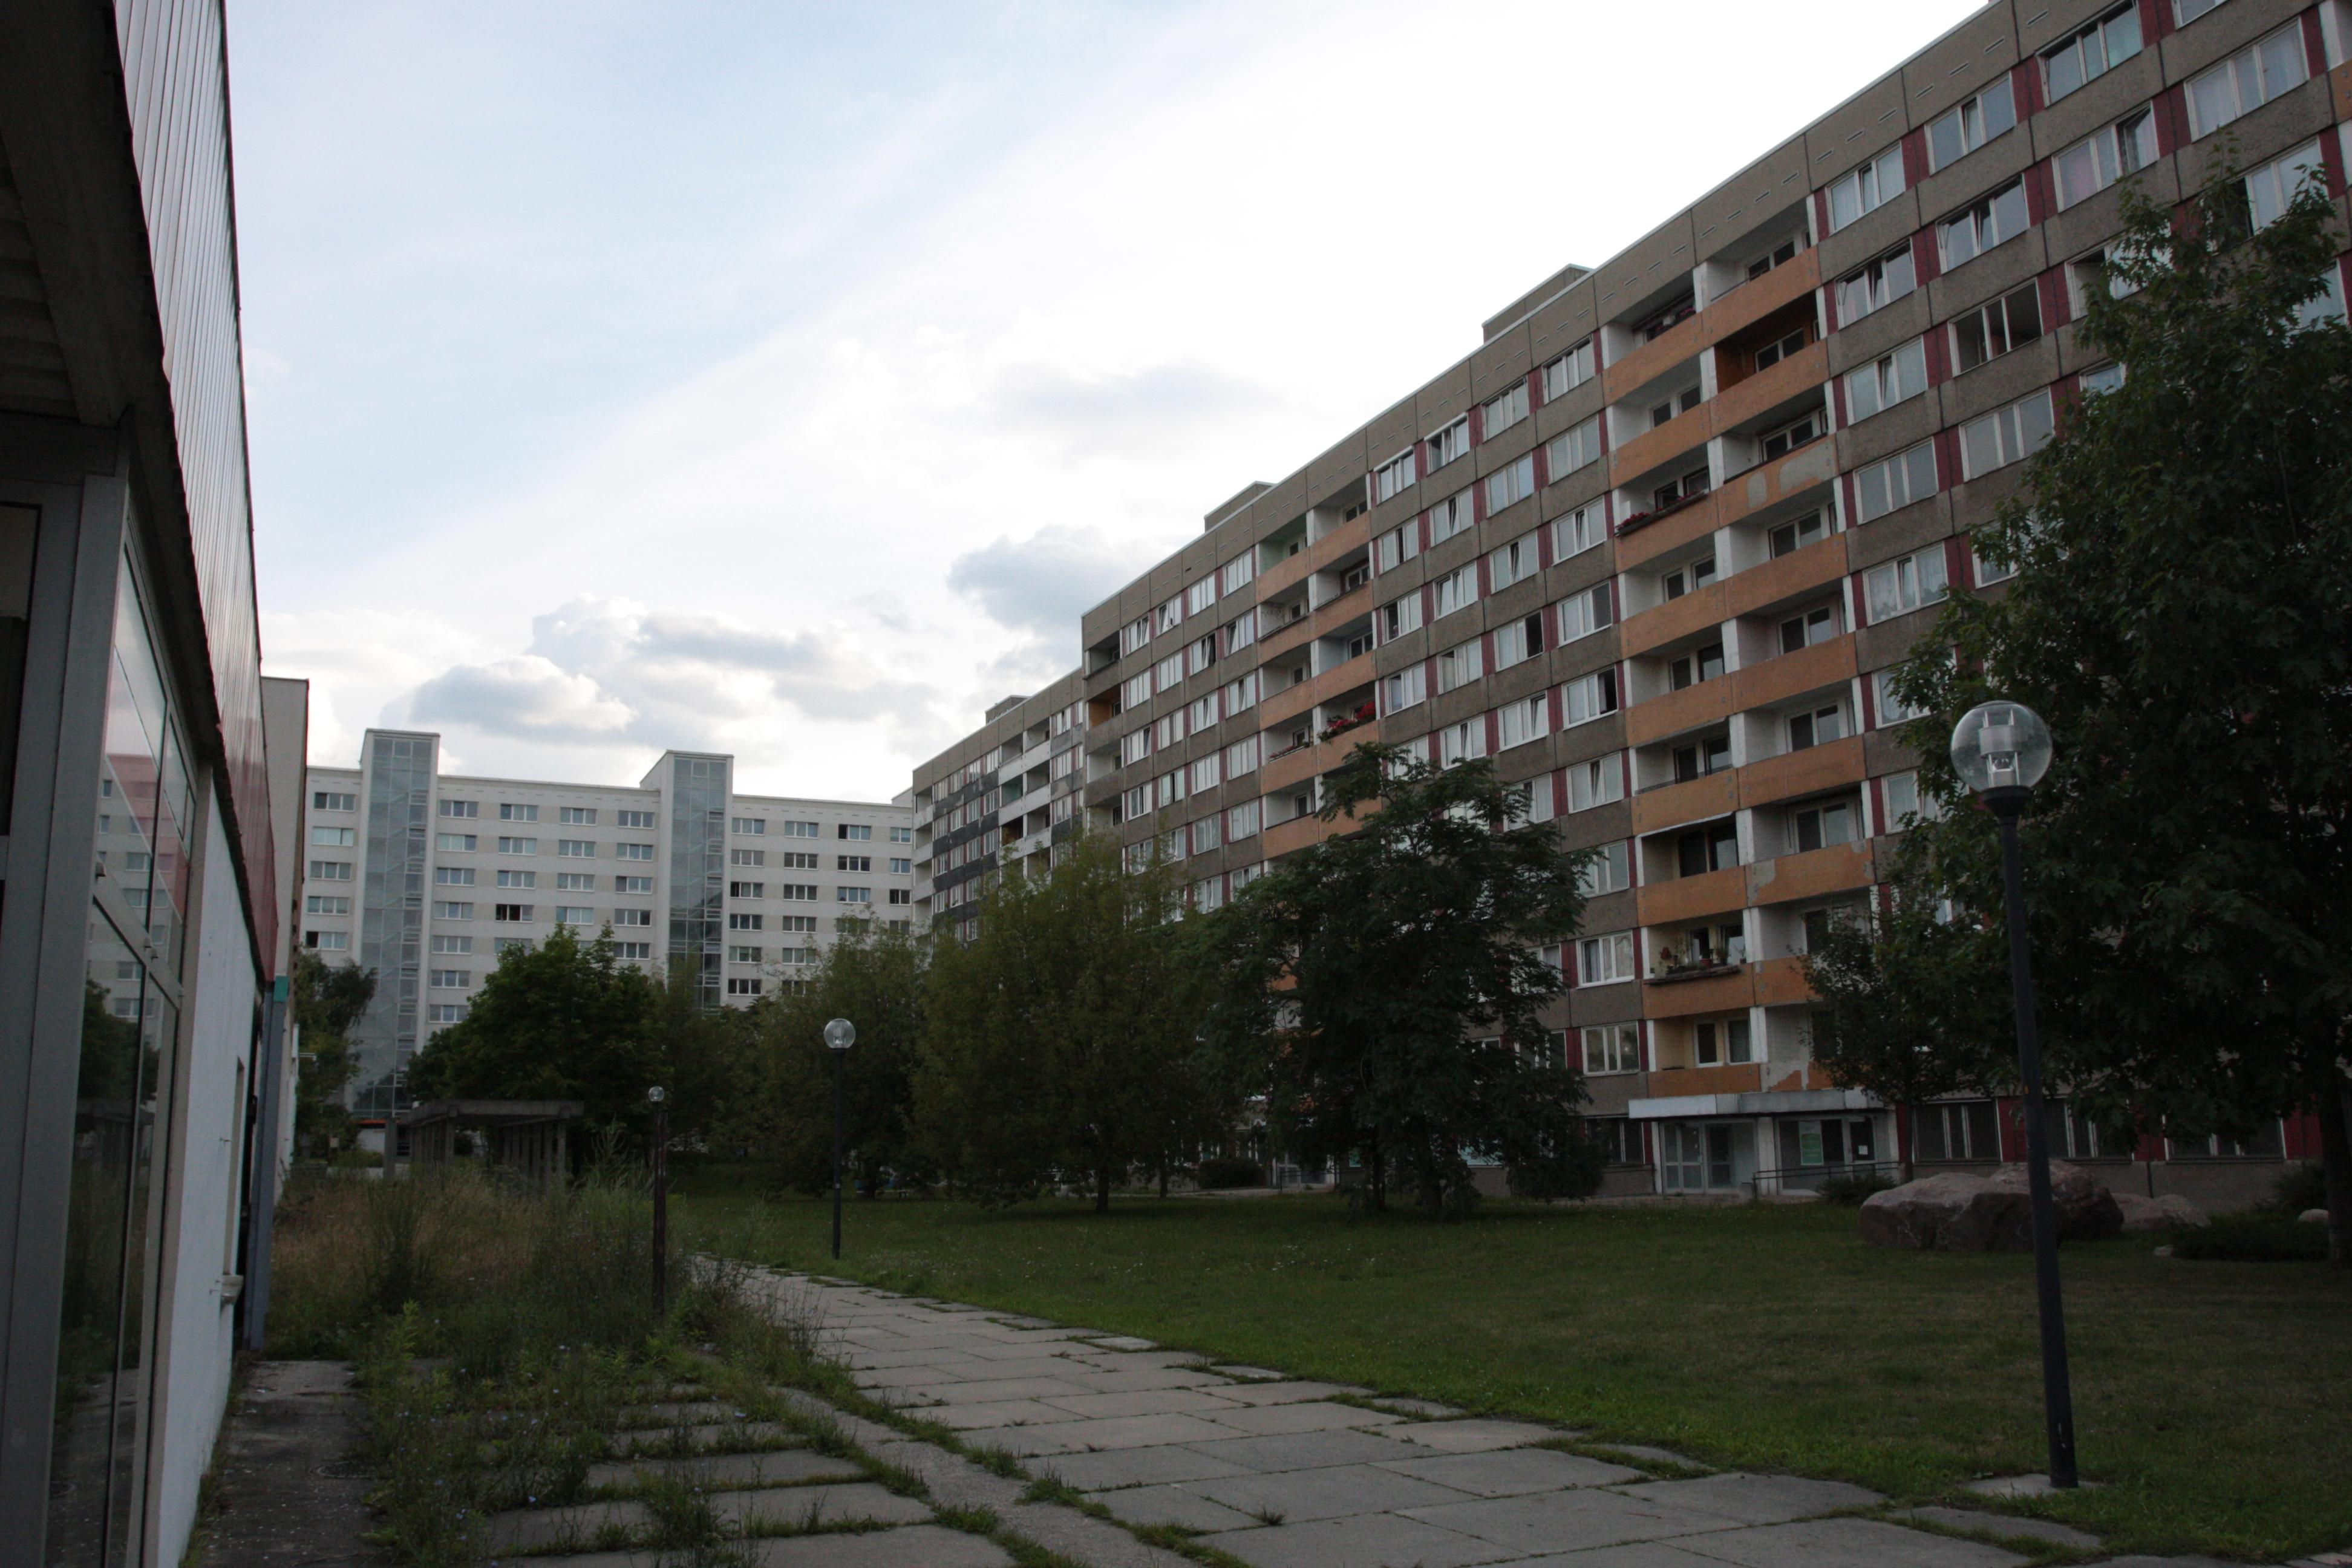 Assi Viertel Berlin